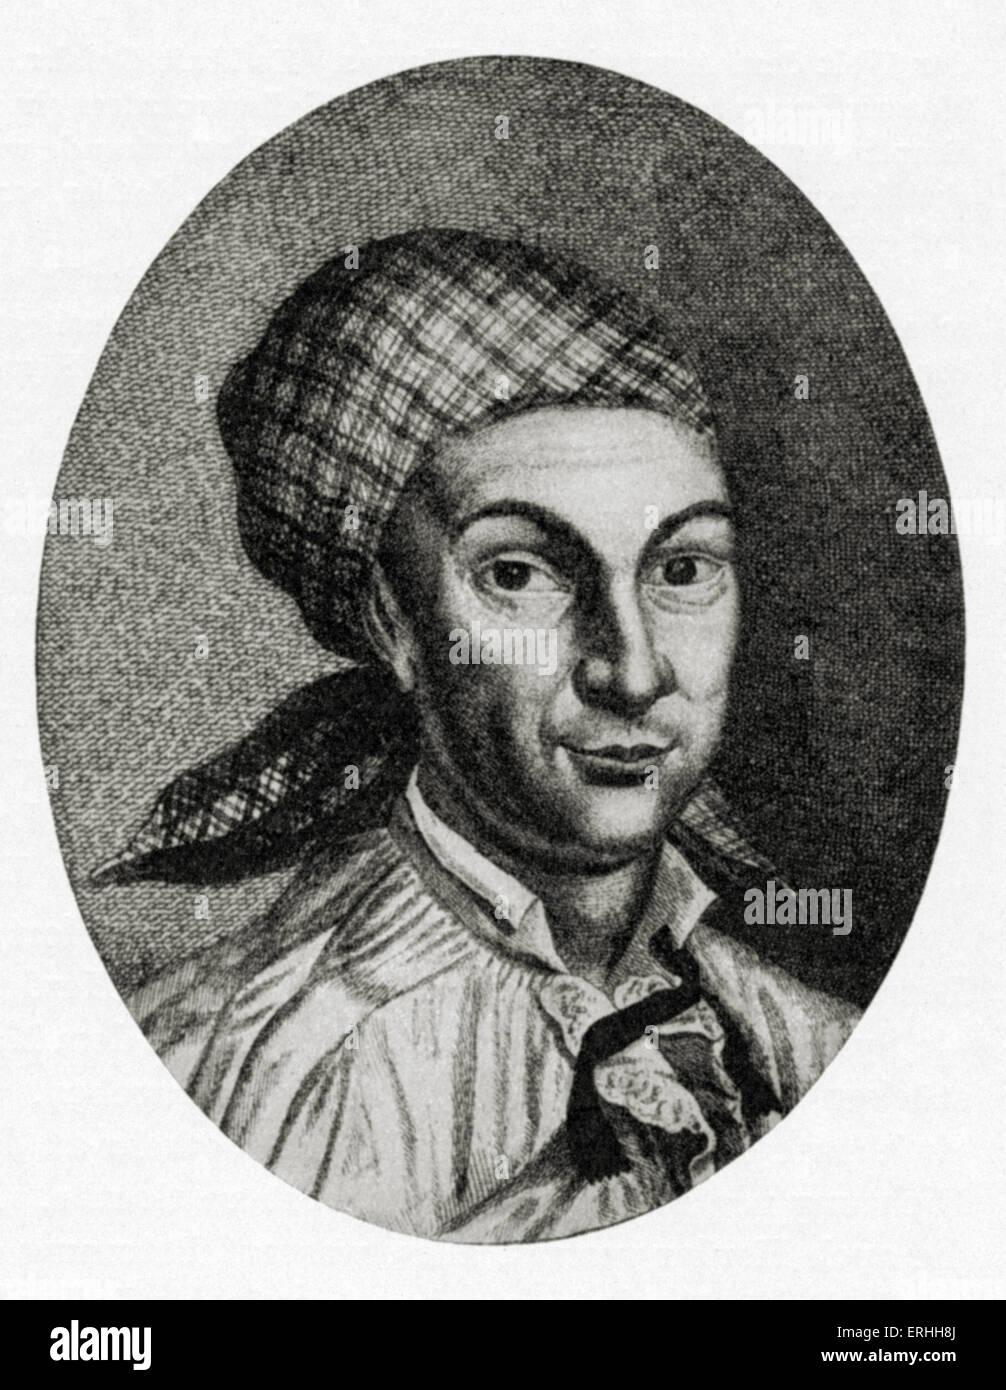 Johann Georg Hamann - portrait of the German philosopher, 27 August 1730 - 21 June 1788. - Stock Image